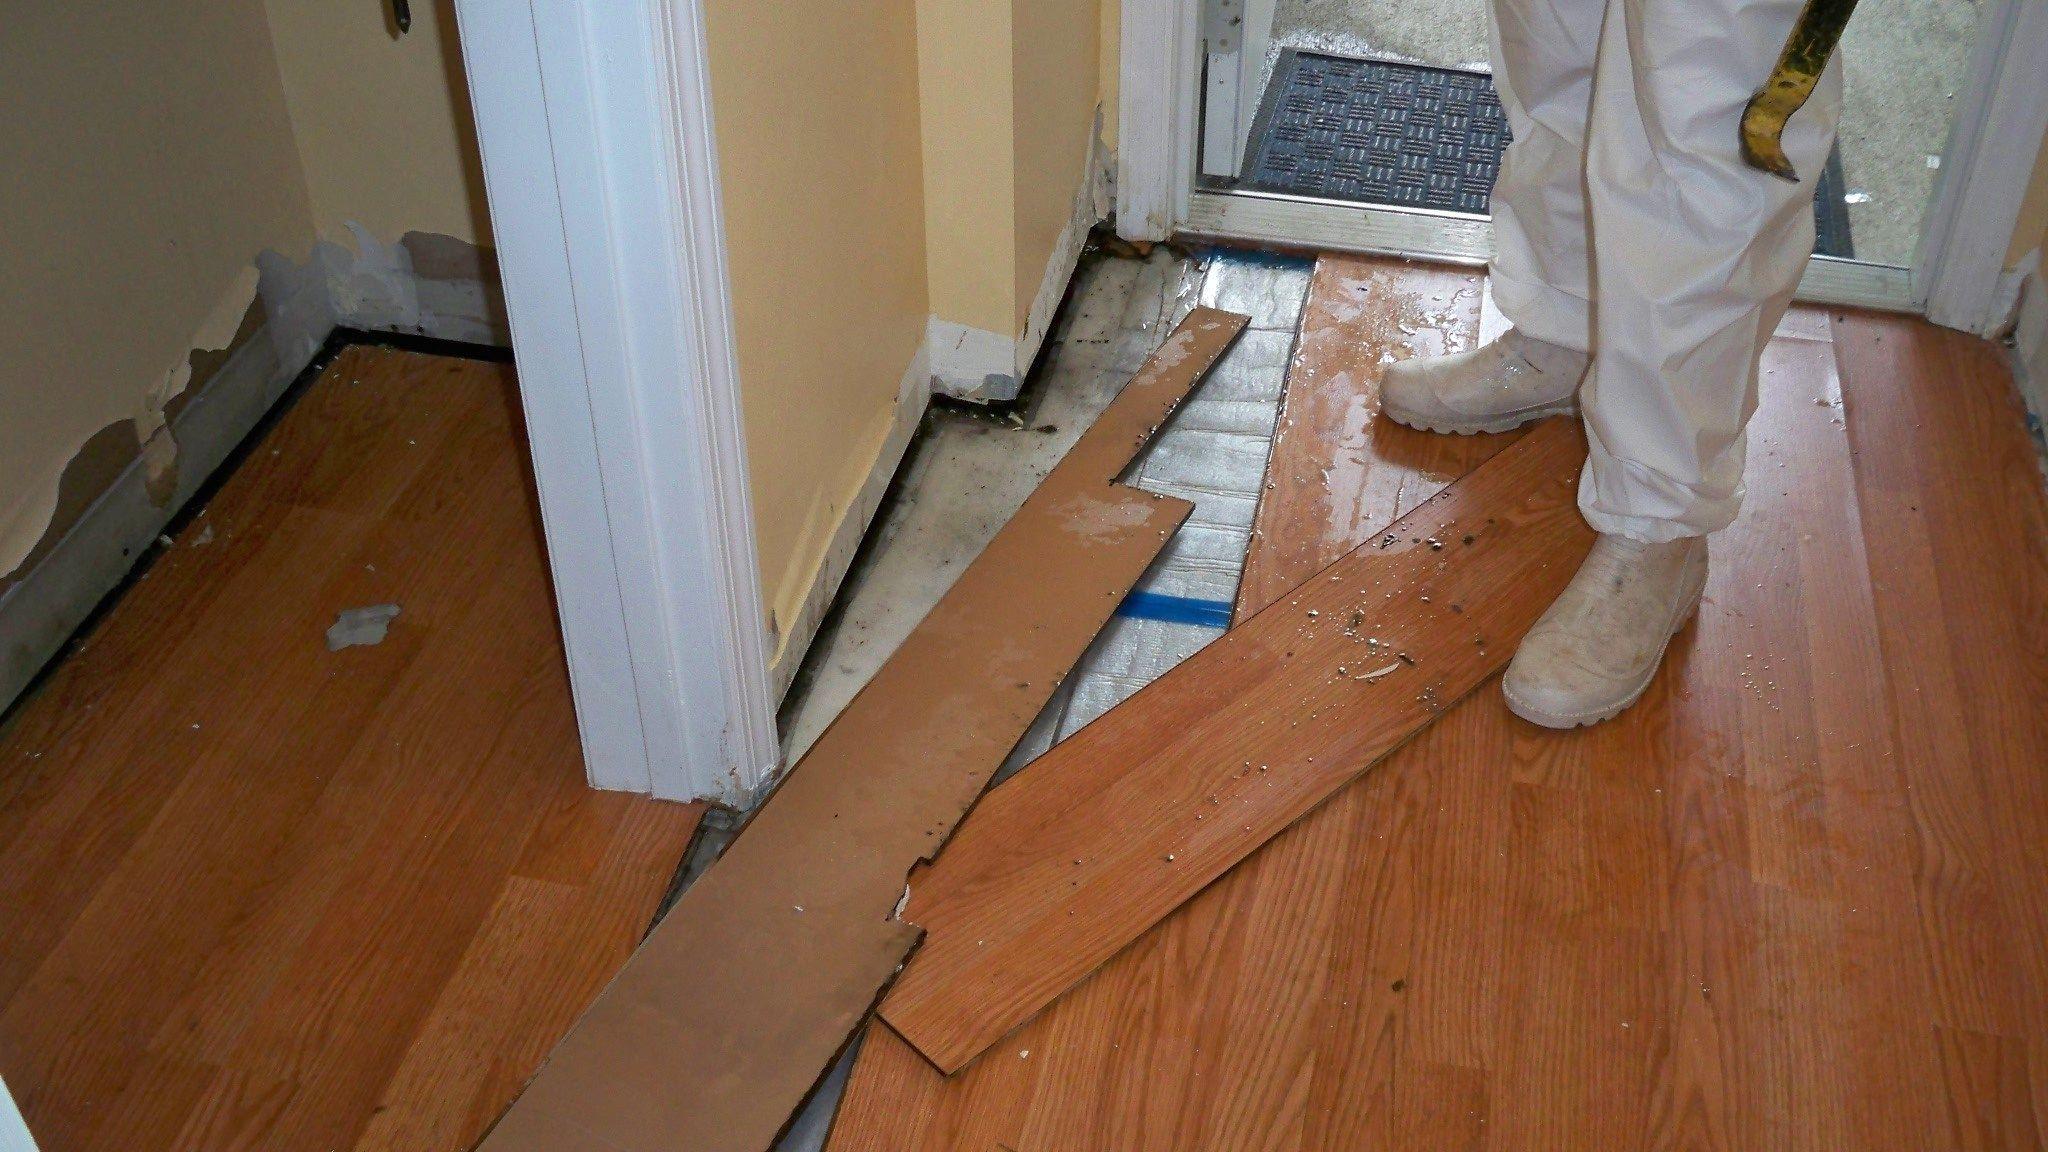 hardwood flooring sydney prices of laminate wood flooring lowes laminate flooring installation cost uk throughout laminate wood flooring lowes laminate flooring installation cost uk laminate flooring cost laminate flooring wood